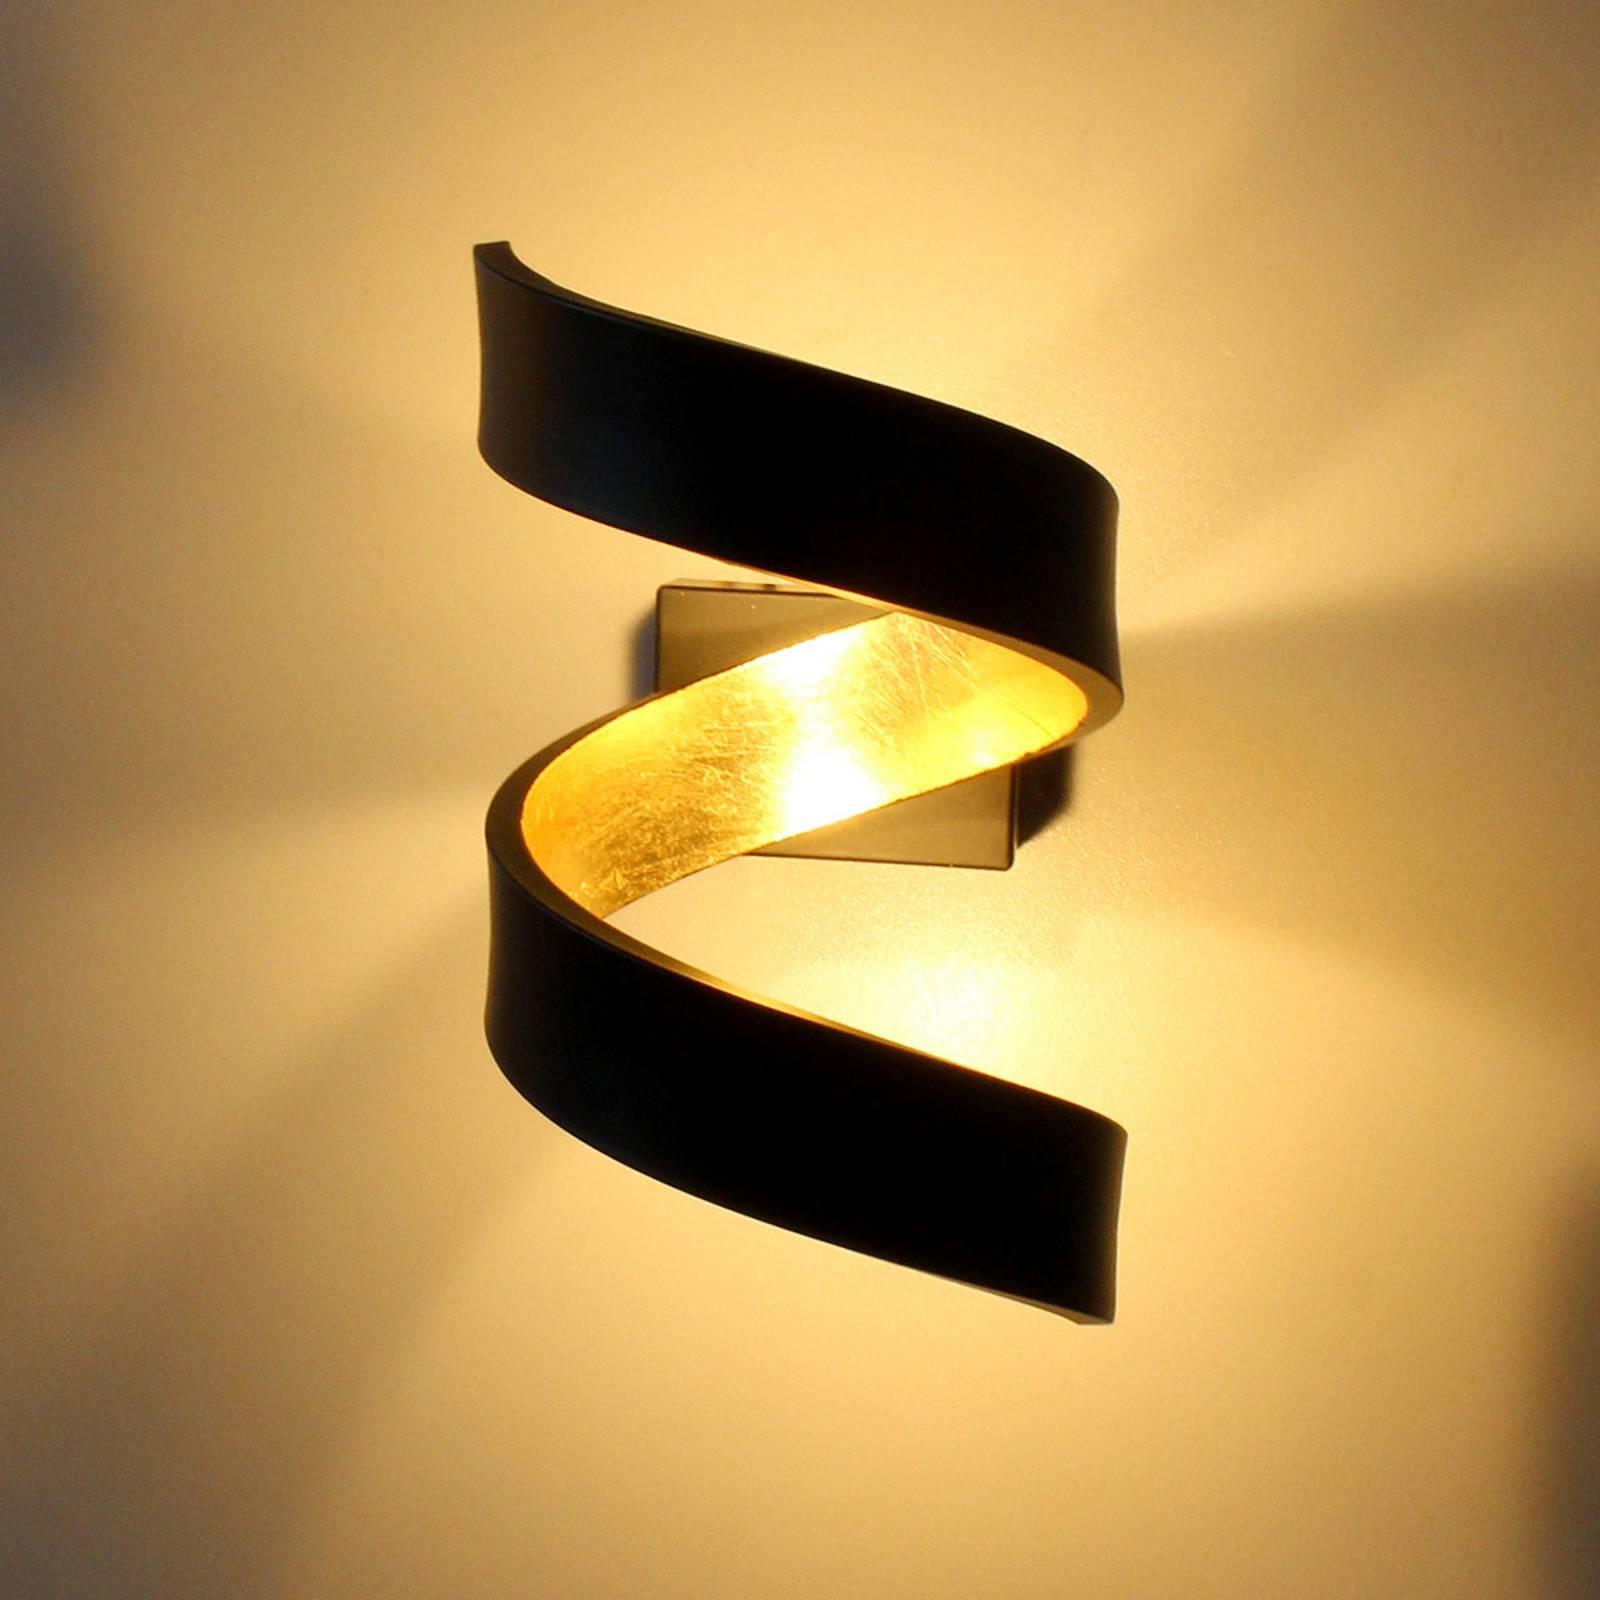 LED wandlamp Helix, zwart-goud, 17 cm